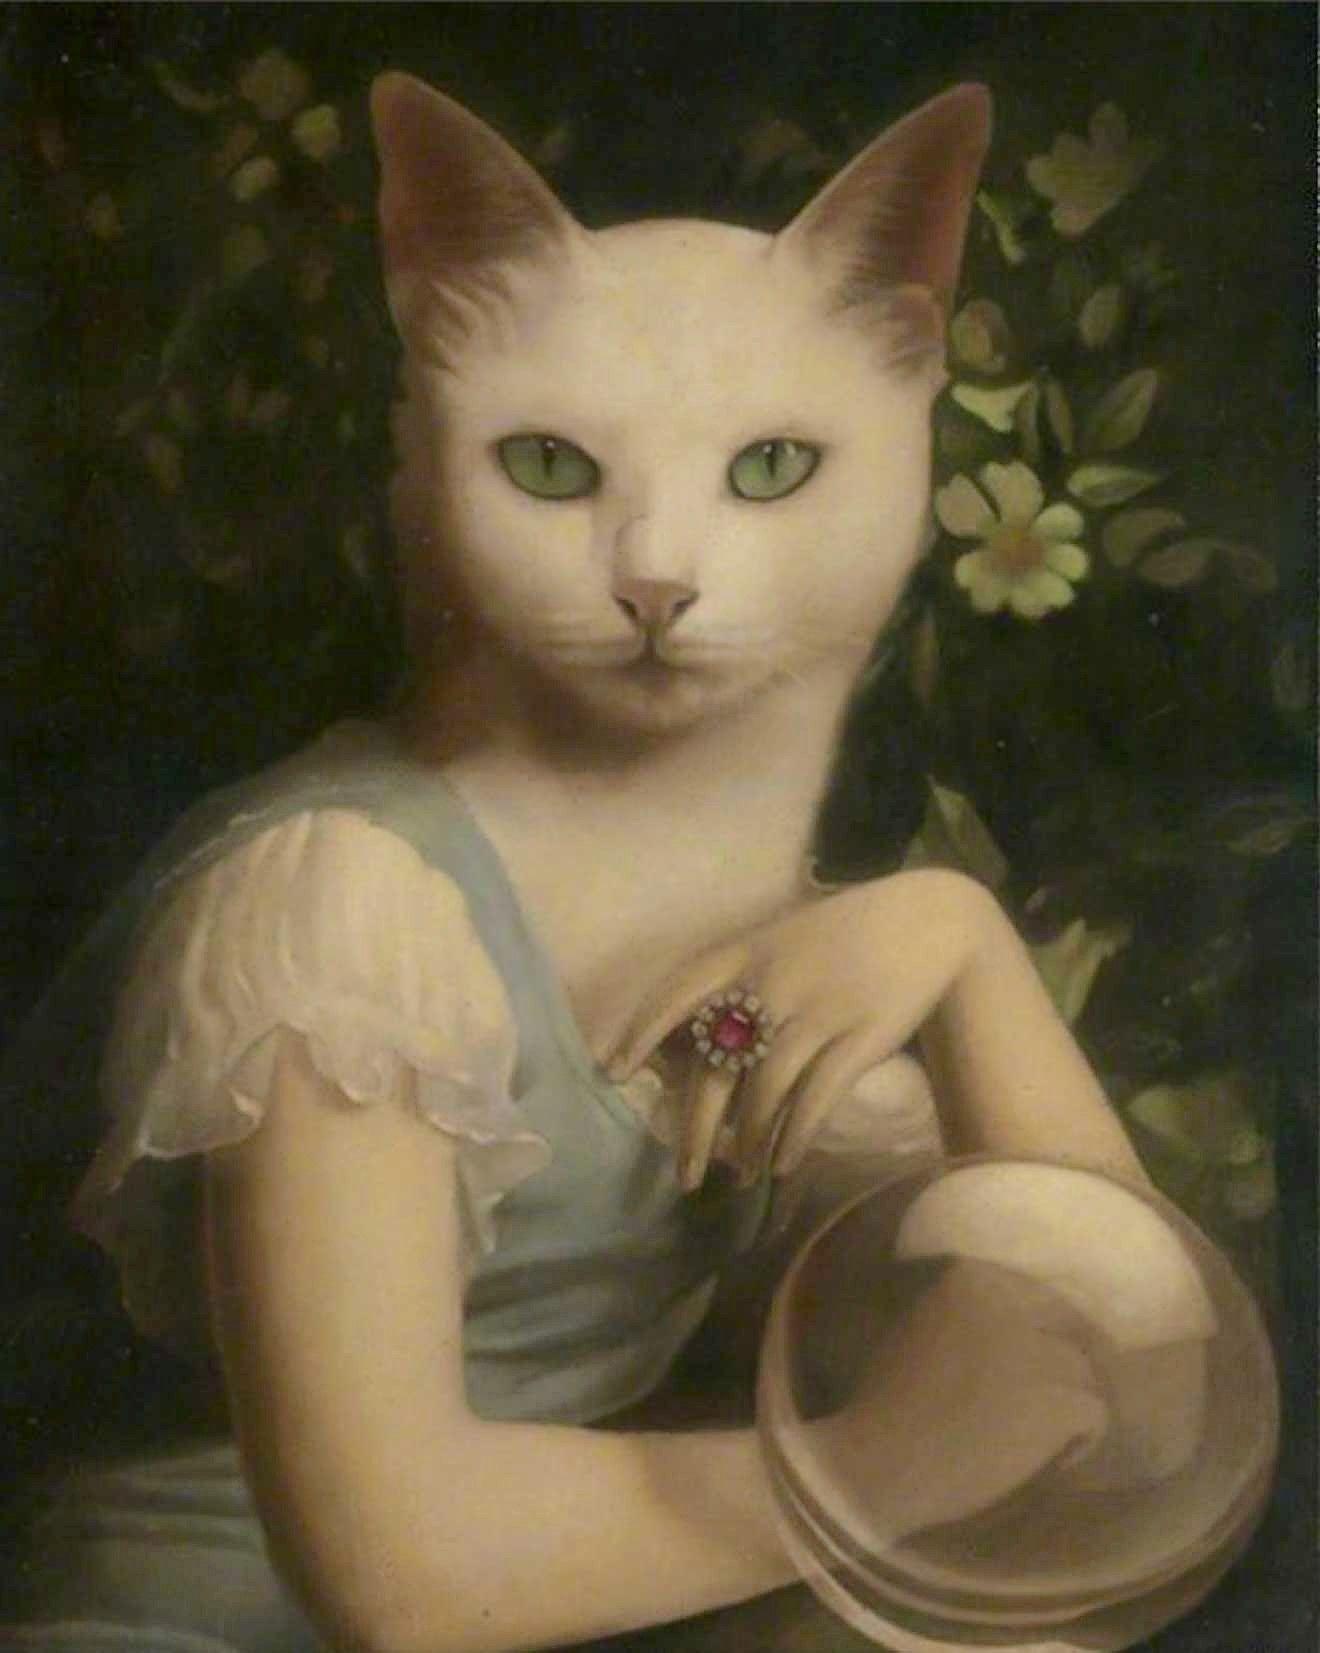 Madamoiselle Mouchete, Stephen Mackey